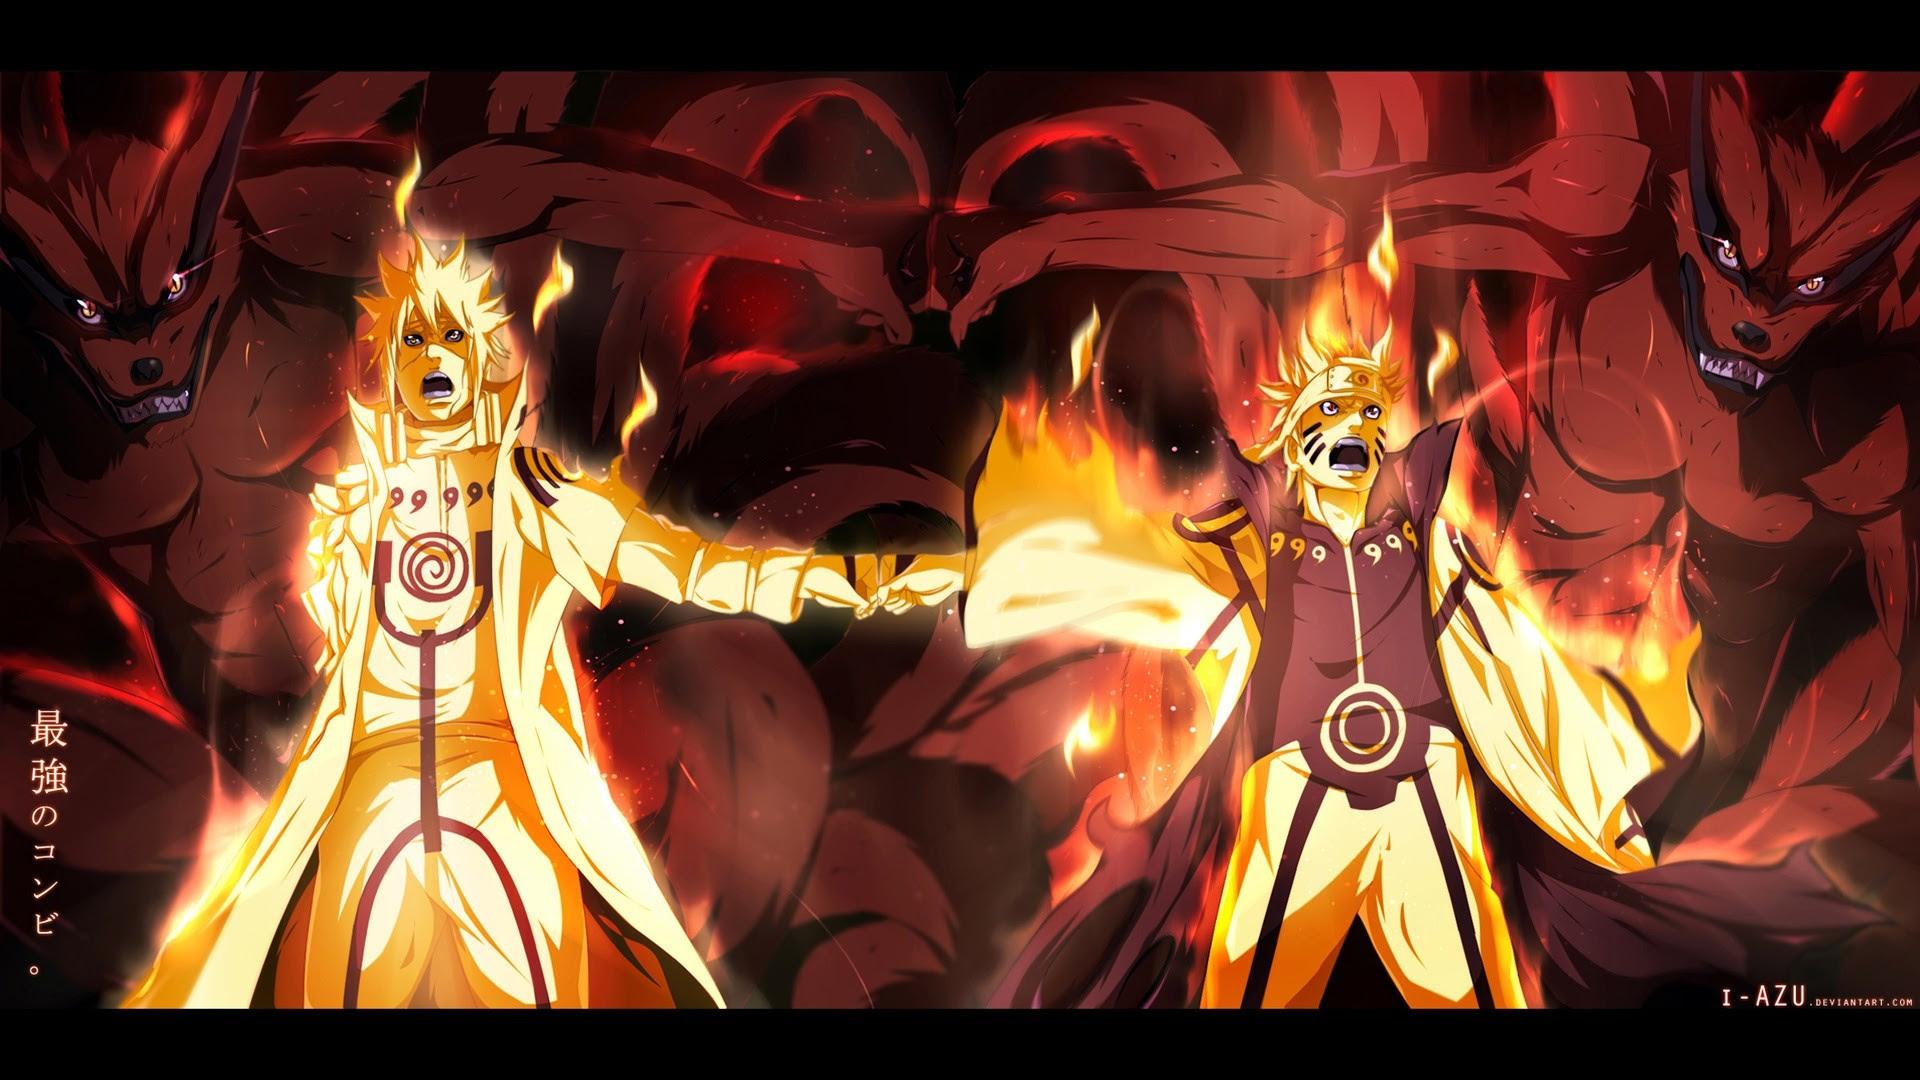 Naruto And Boruto Wallpaper 3840x2160